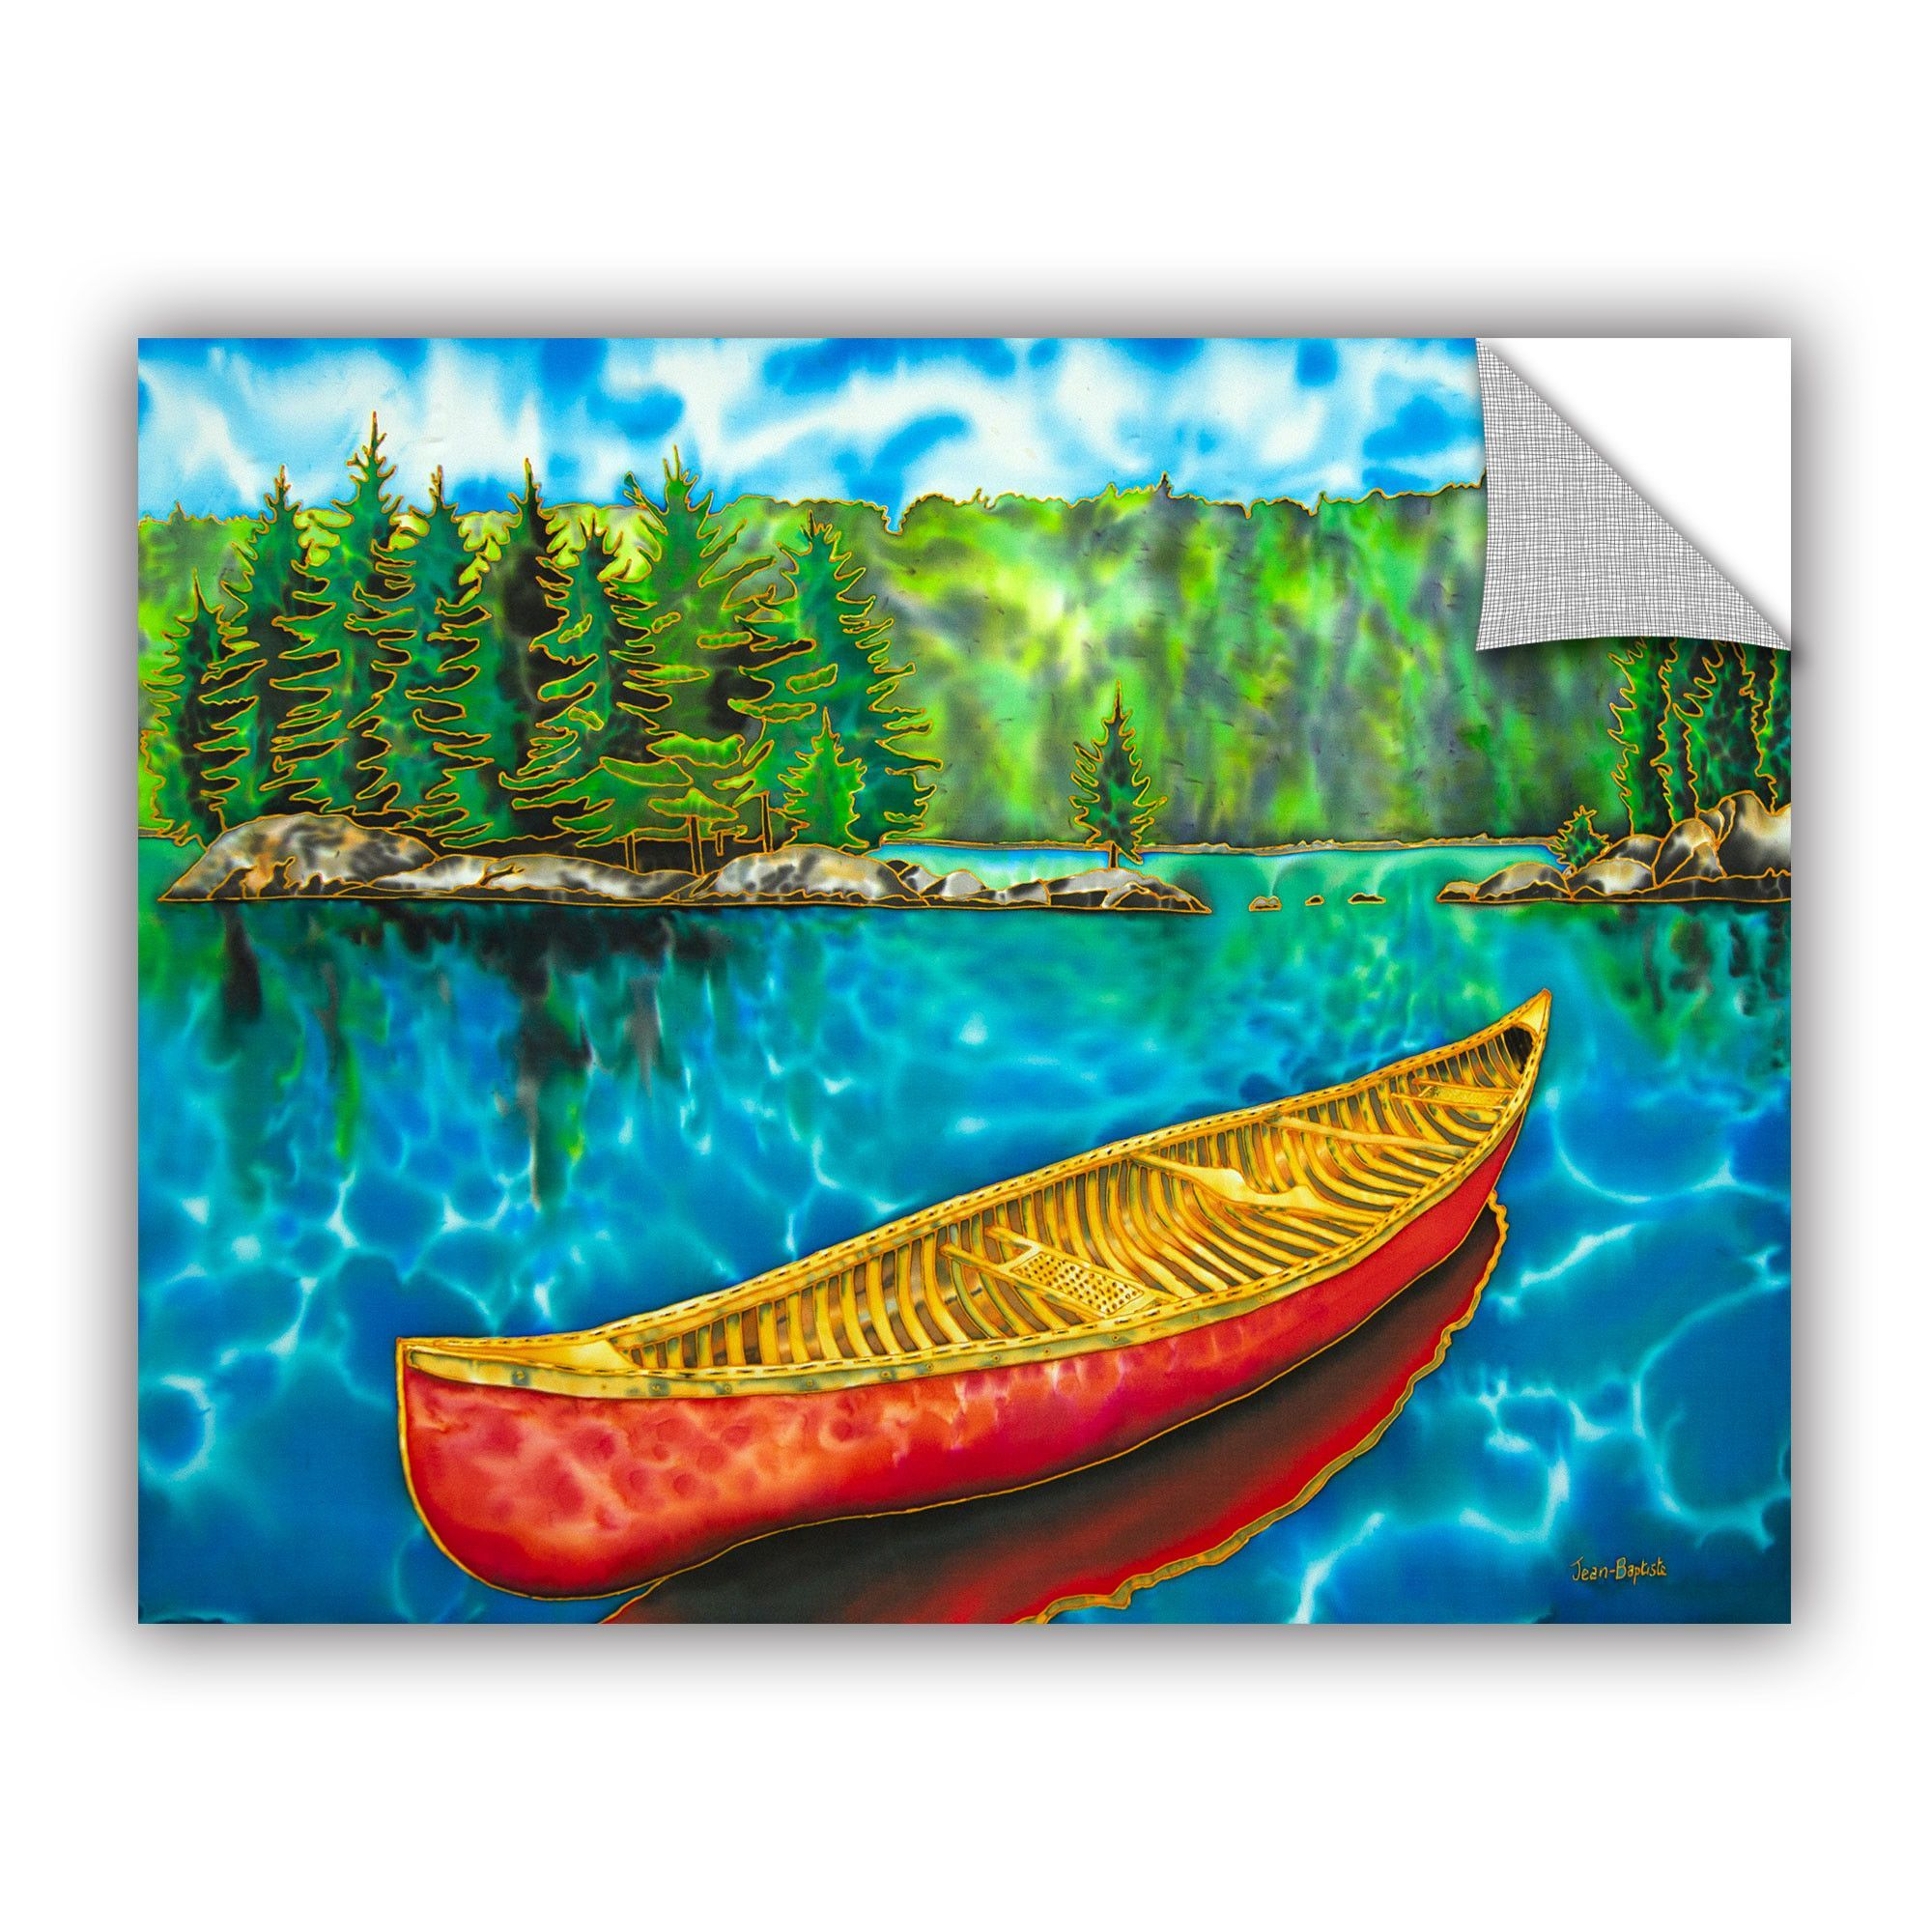 Daniel Jean Baptiste Algonquin Park Canada Red Canoe Wall Mural